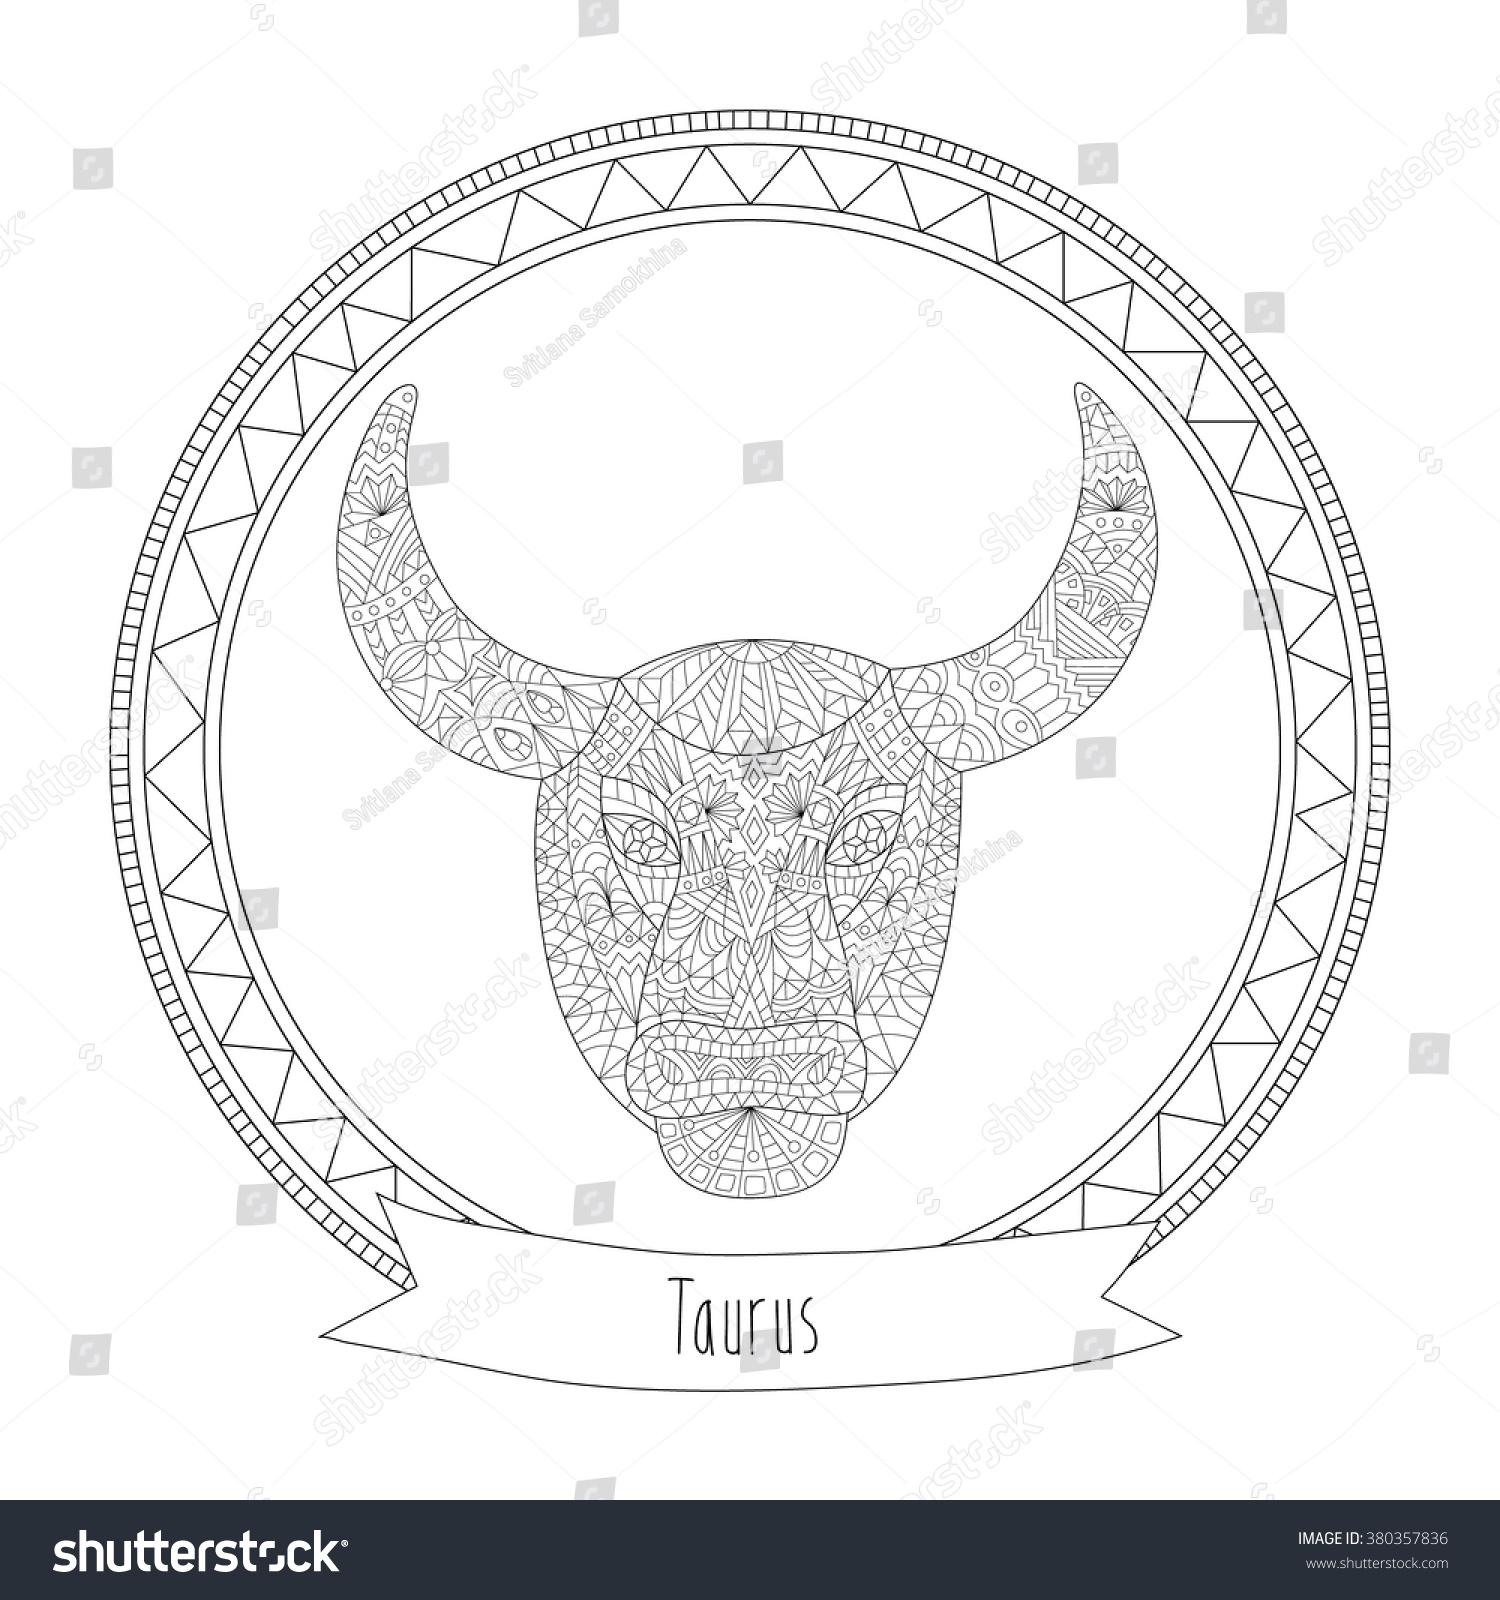 Handdrawn Zodiac Taurus Ethnic Floral Geometric Stock Vector